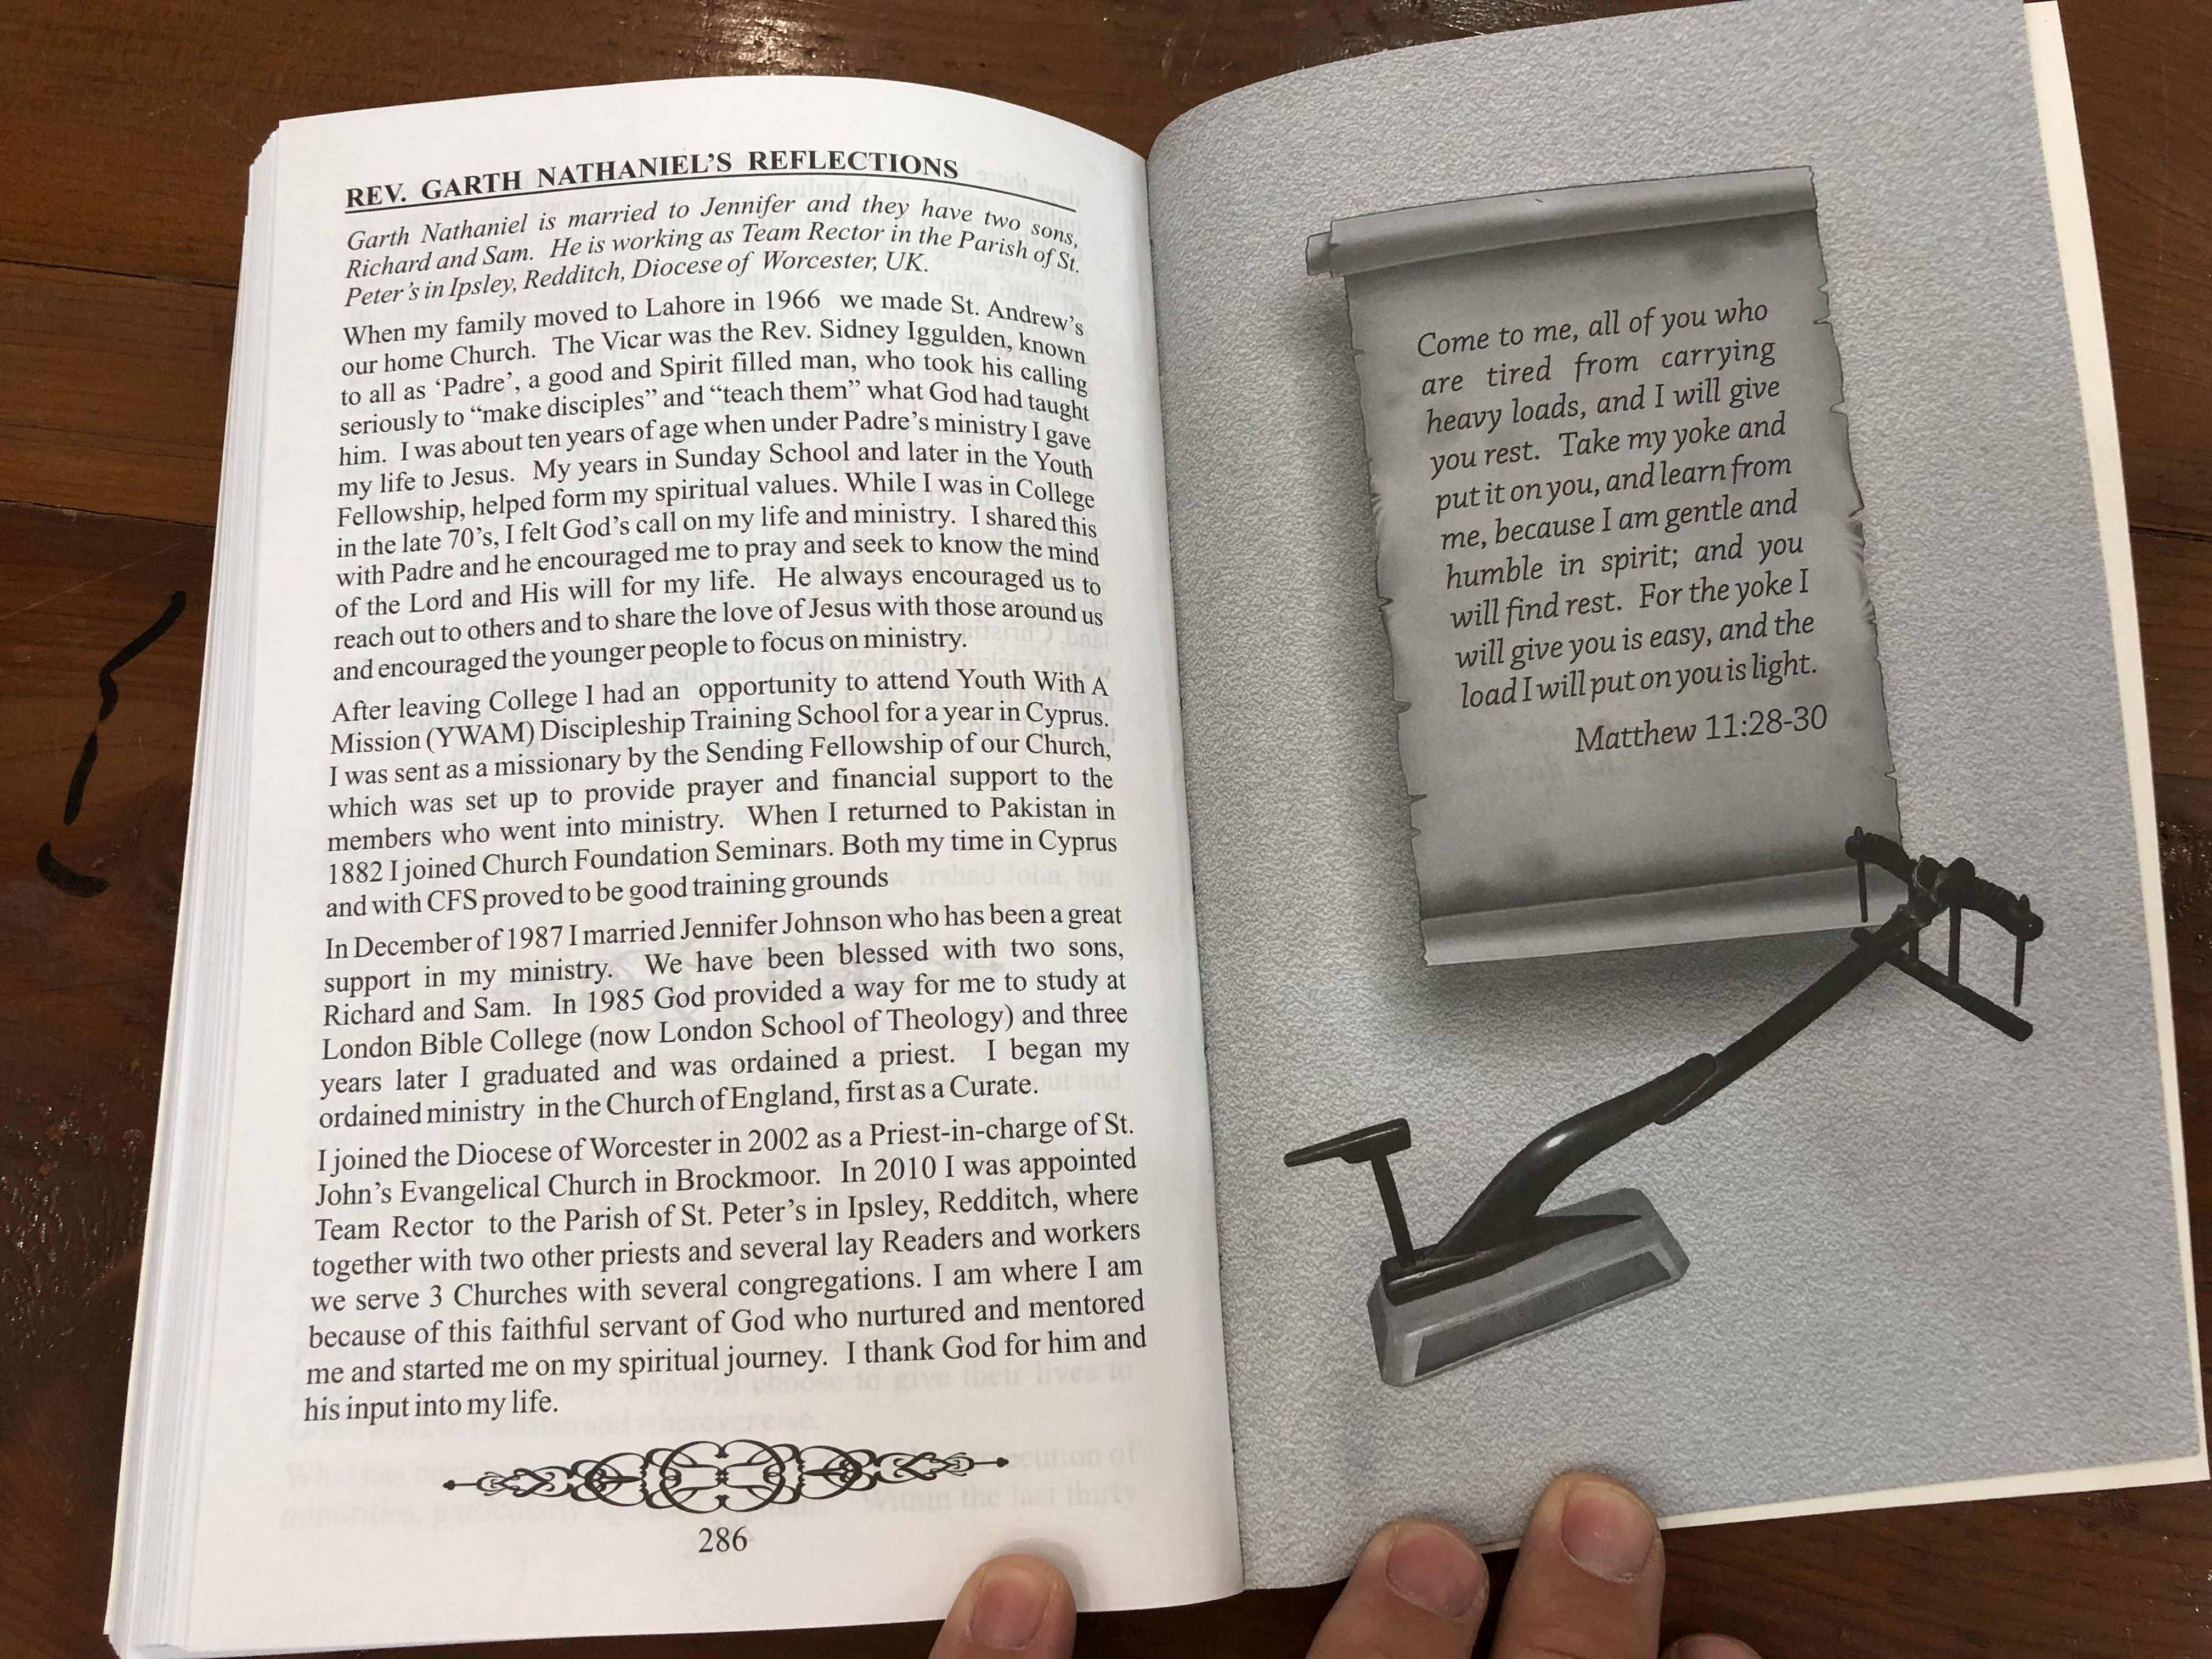 grasped-by-god-for-god-memoirs-of-rev.-sidney-h.-iggulden-pakistan-bible-society-2015-15-.jpg